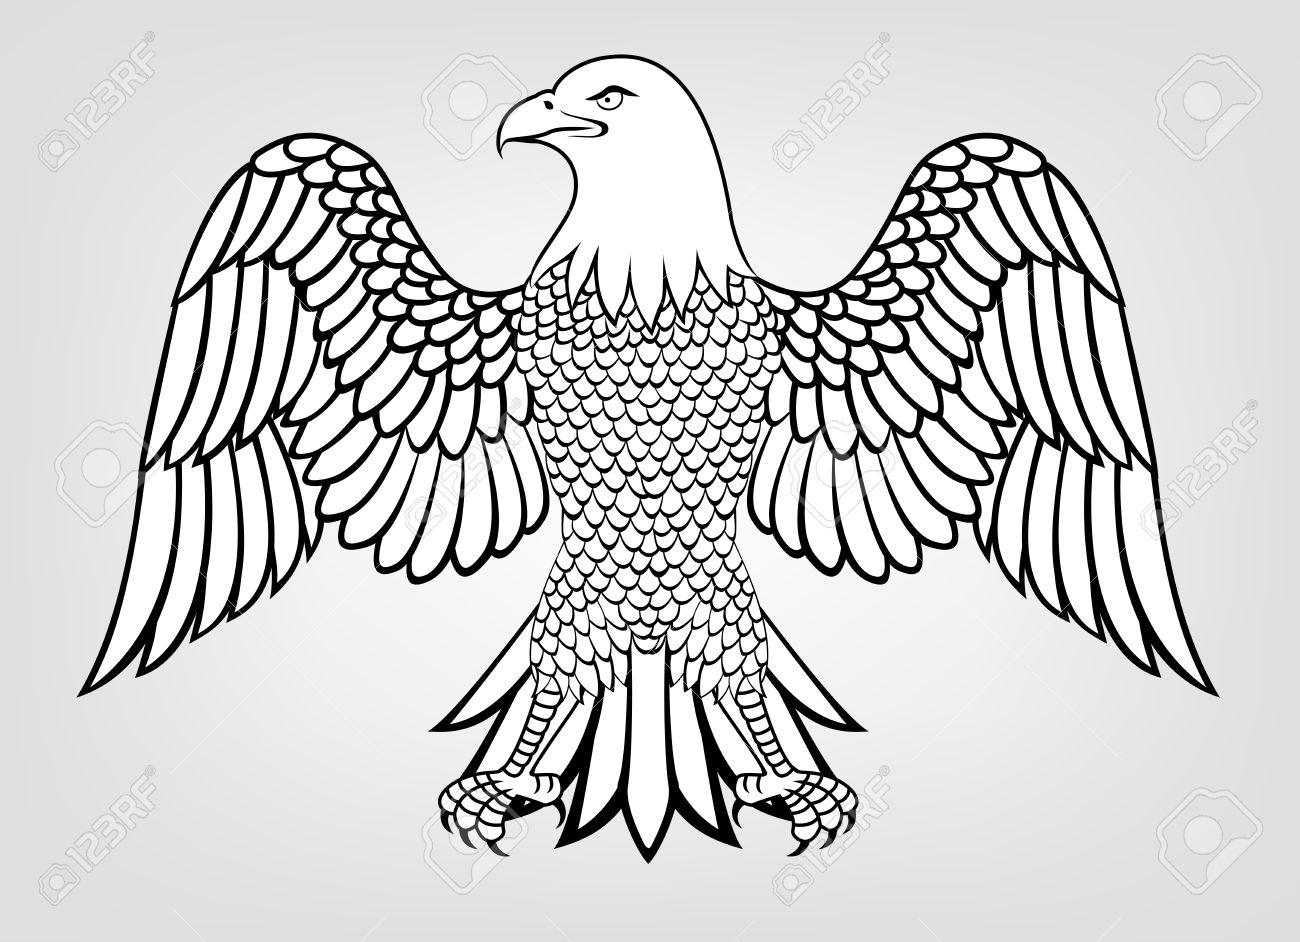 1300x942 Illustration Of Eagle Mascot Royalty Free Cliparts, Vectors,